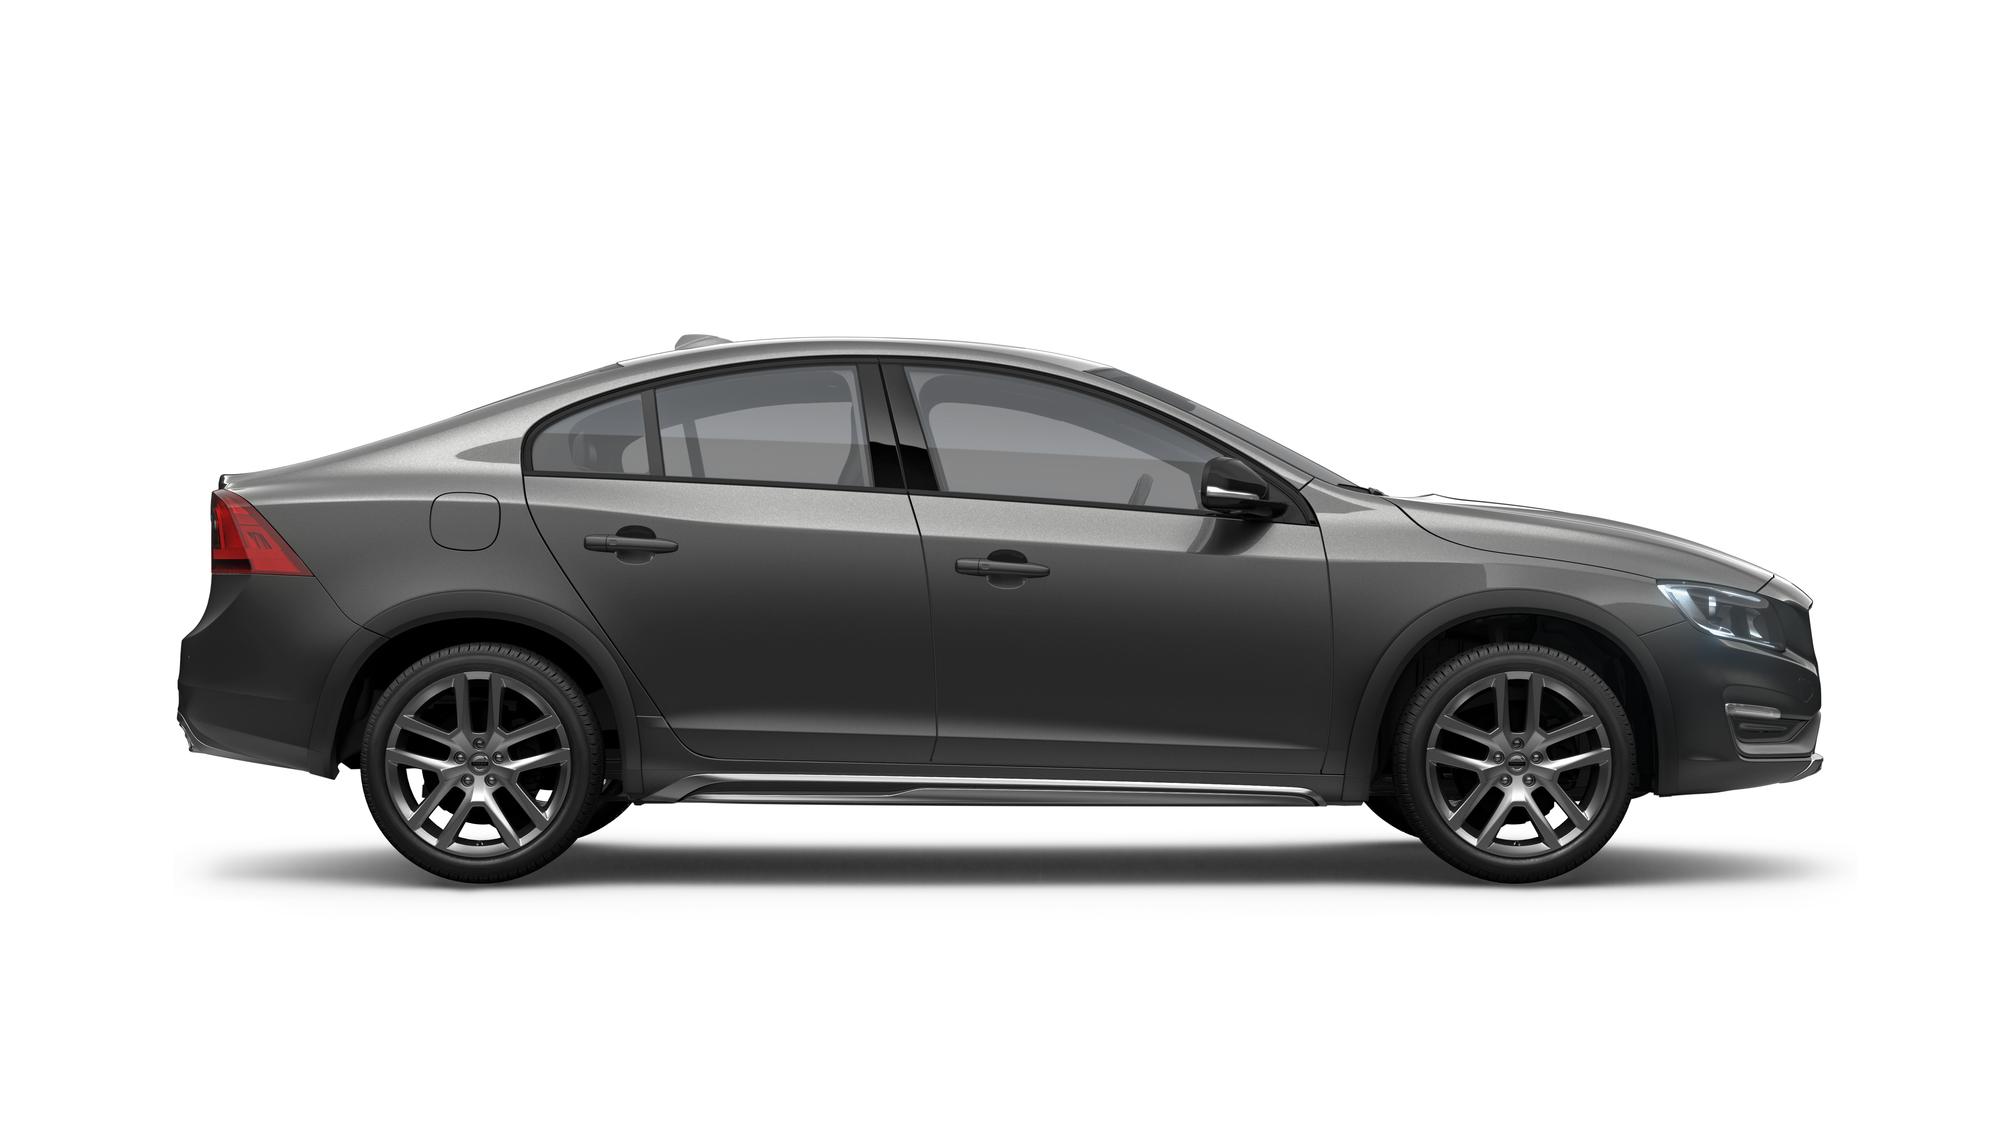 Volvo s60 savile grey metallic images - 2017 Volvo S60 Cross Country Exterior Colors